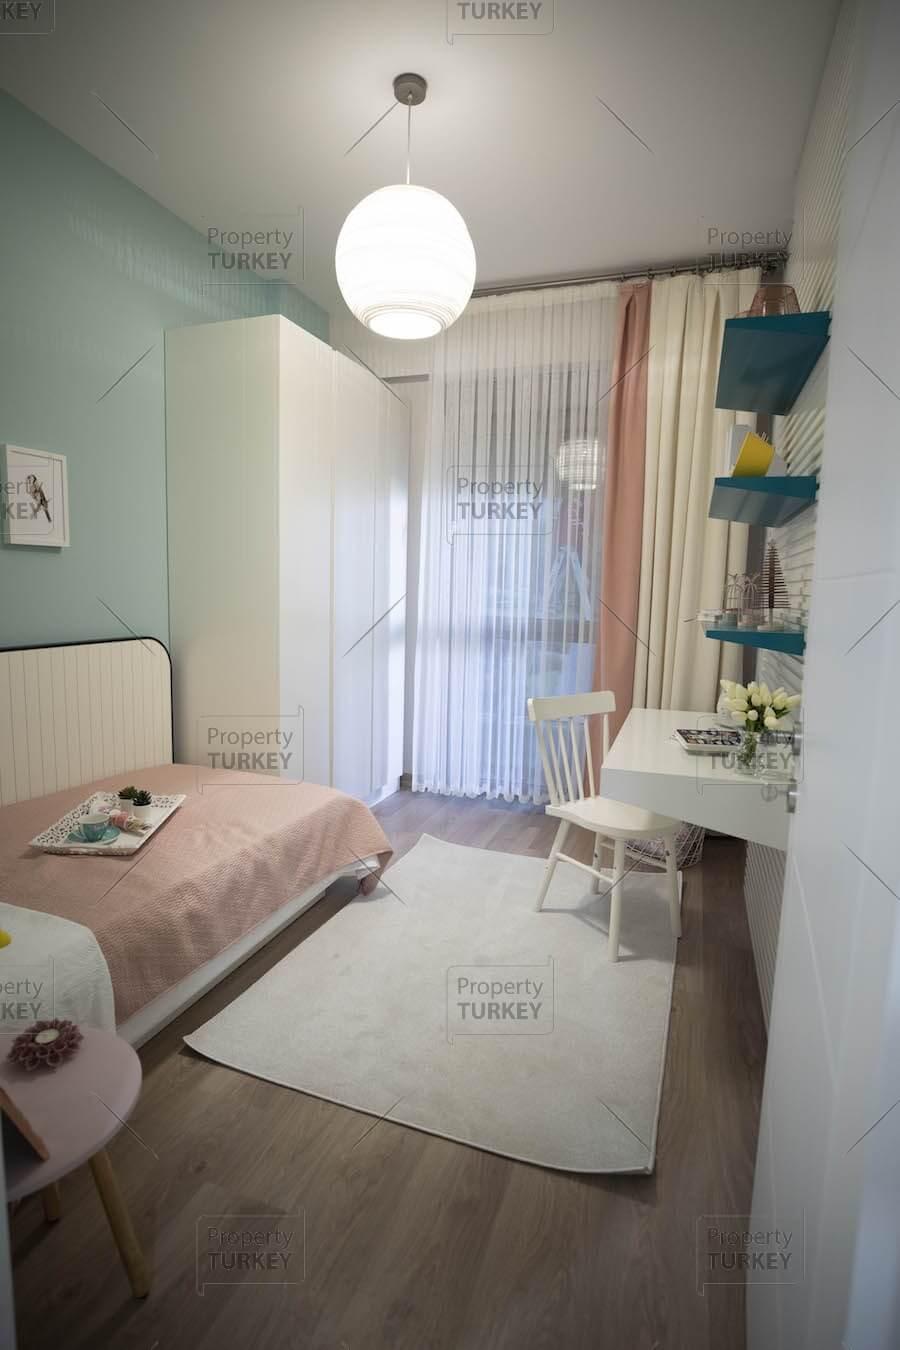 Apartments room